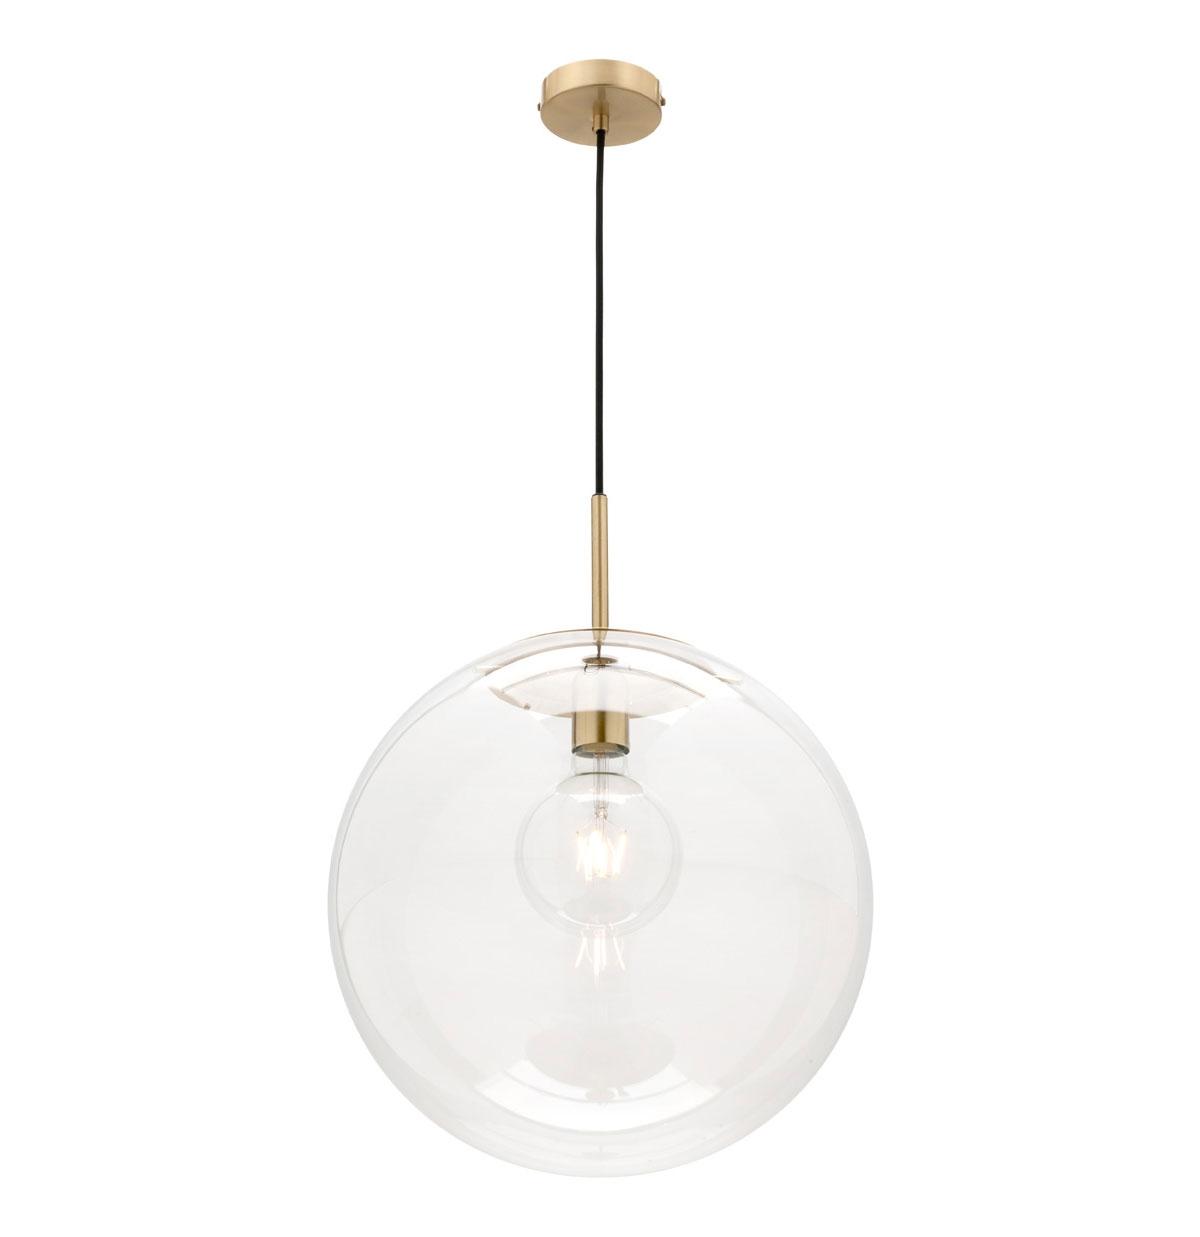 outdoor lighting light fittings lights led lighting madrid large